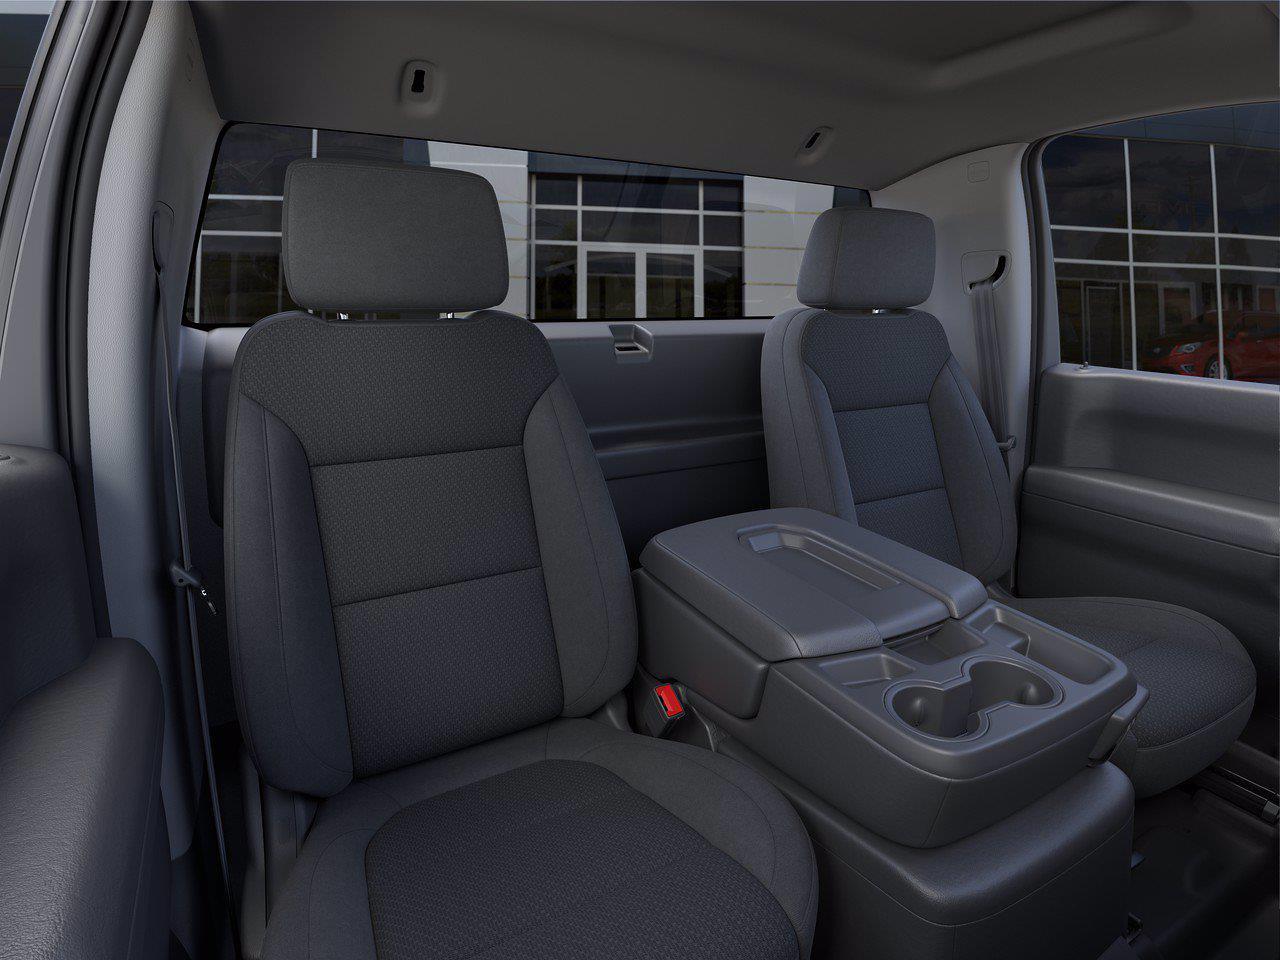 2021 GMC Sierra 1500 Regular Cab 4x4, Pickup #416065 - photo 13